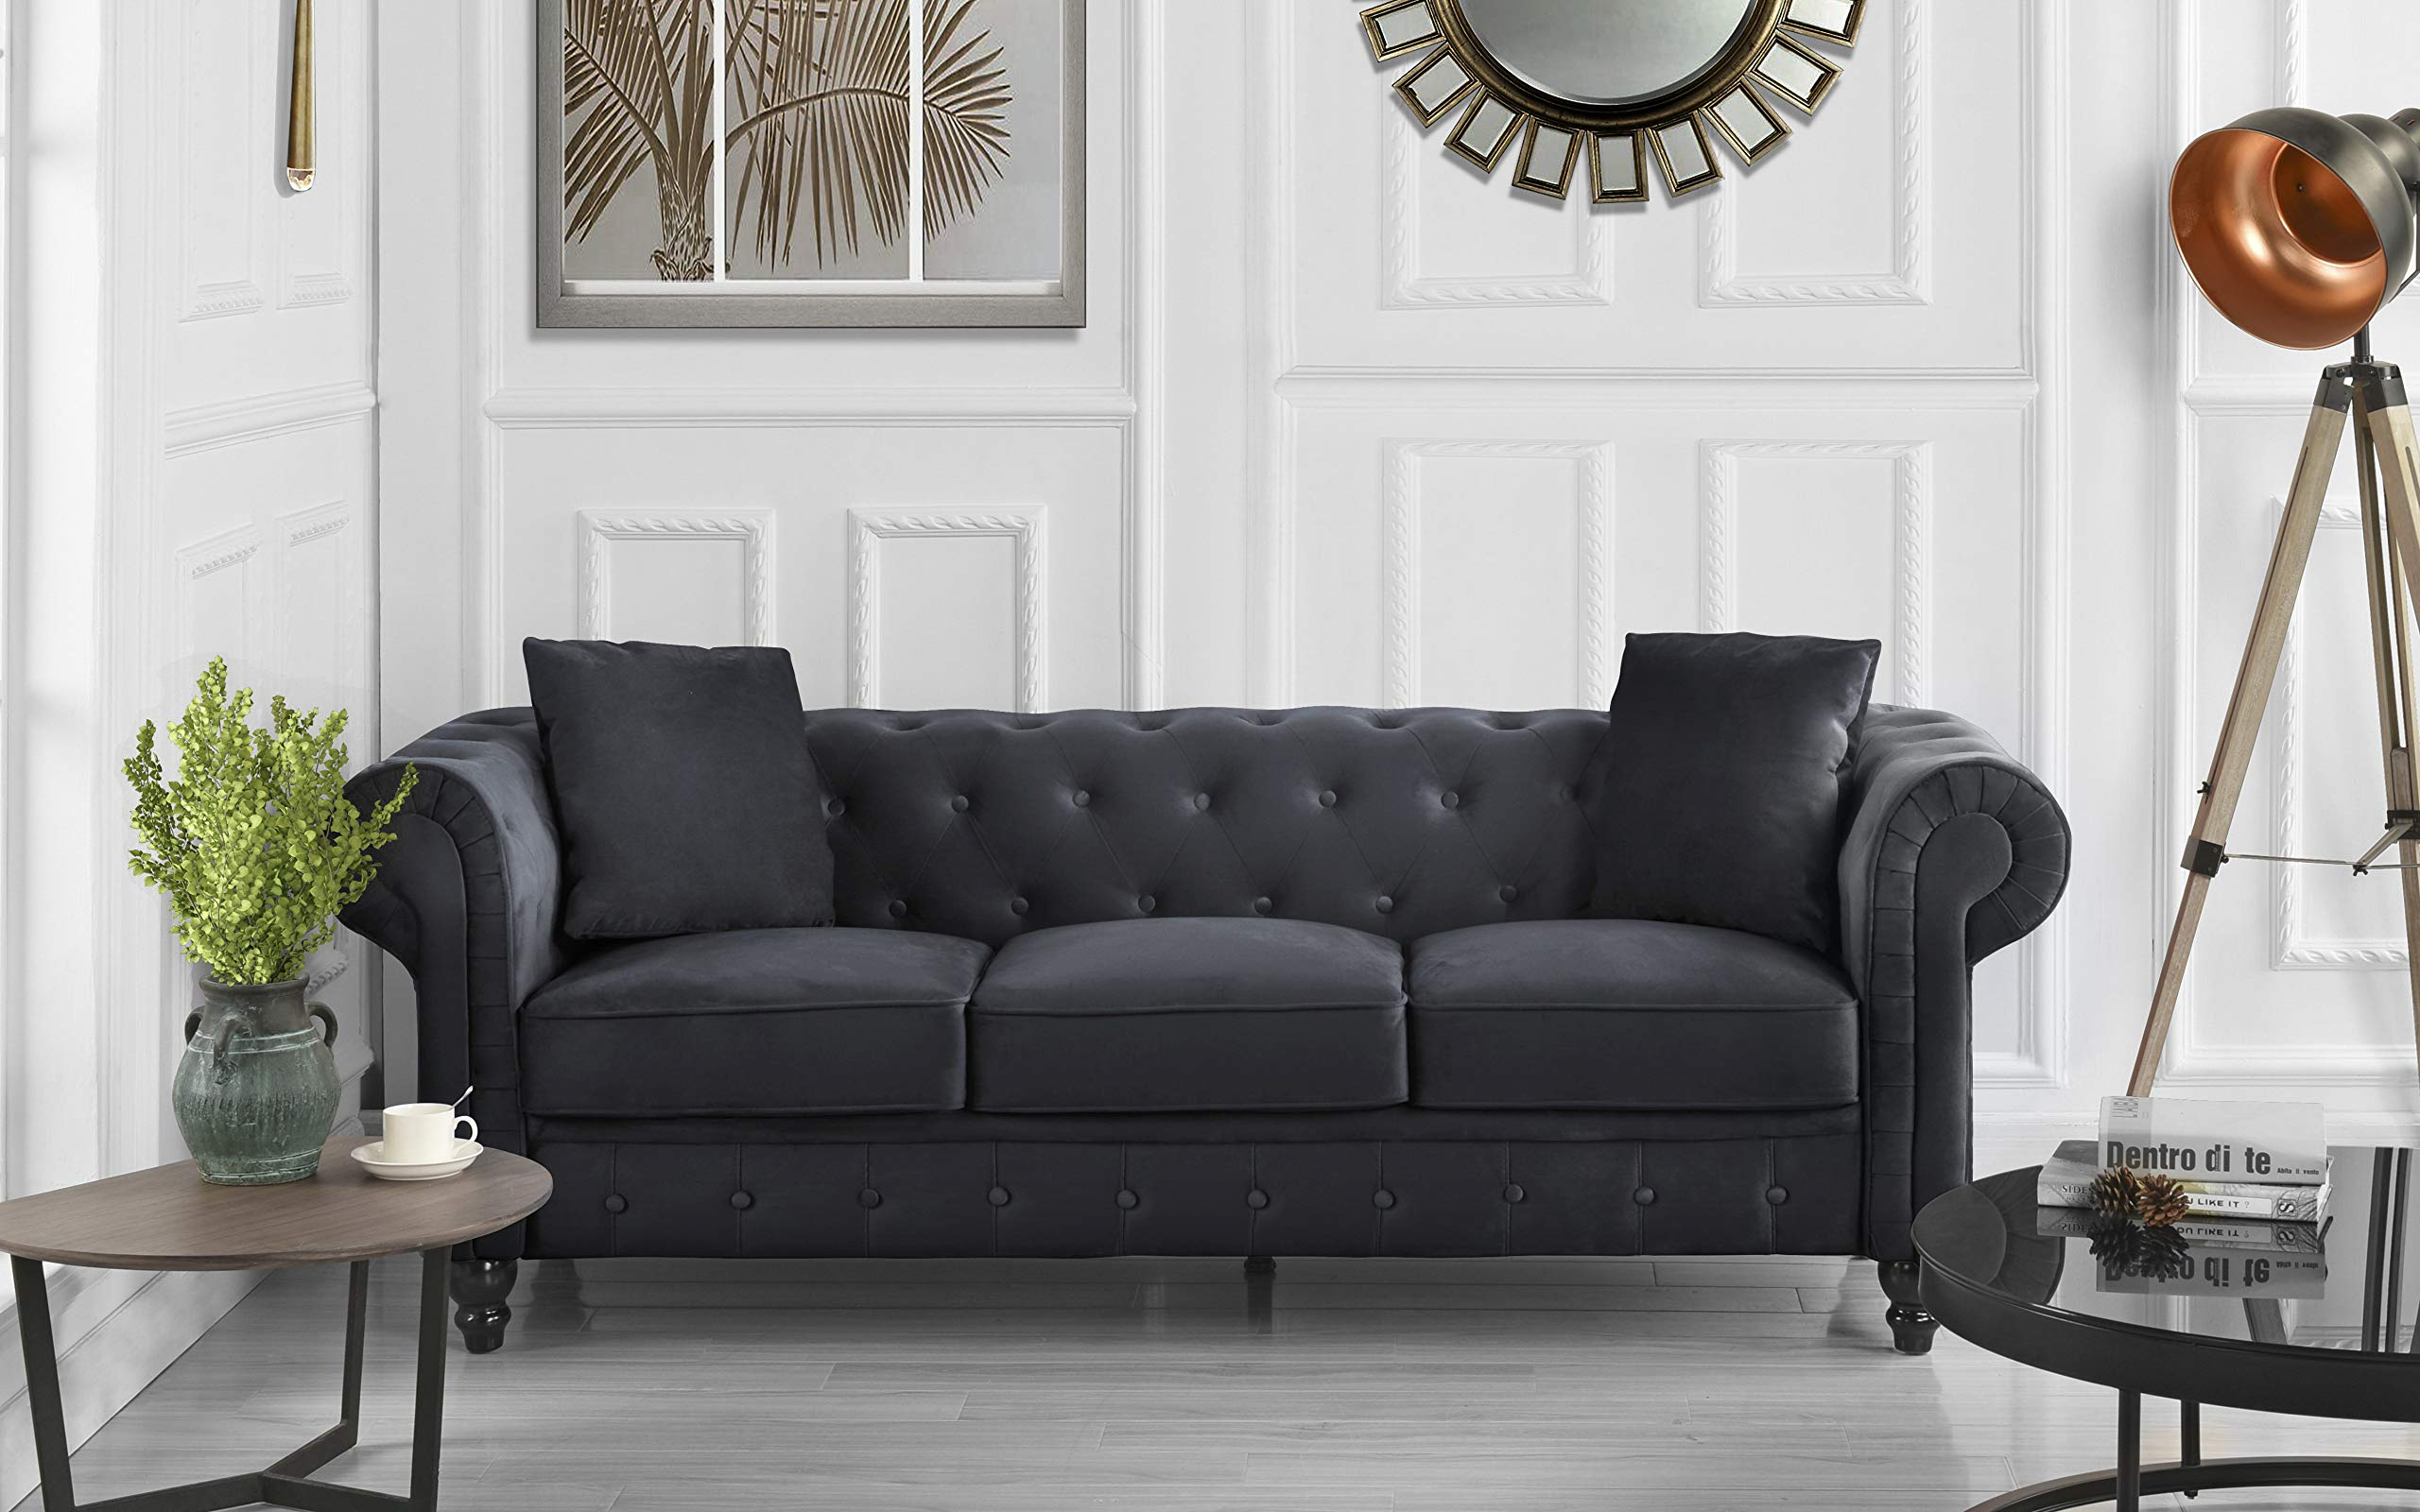 Divano Roma Furniture Classic Velvet Scroll Arm Tufted Button Chesterfield Sofa (Black) by Divano Roma